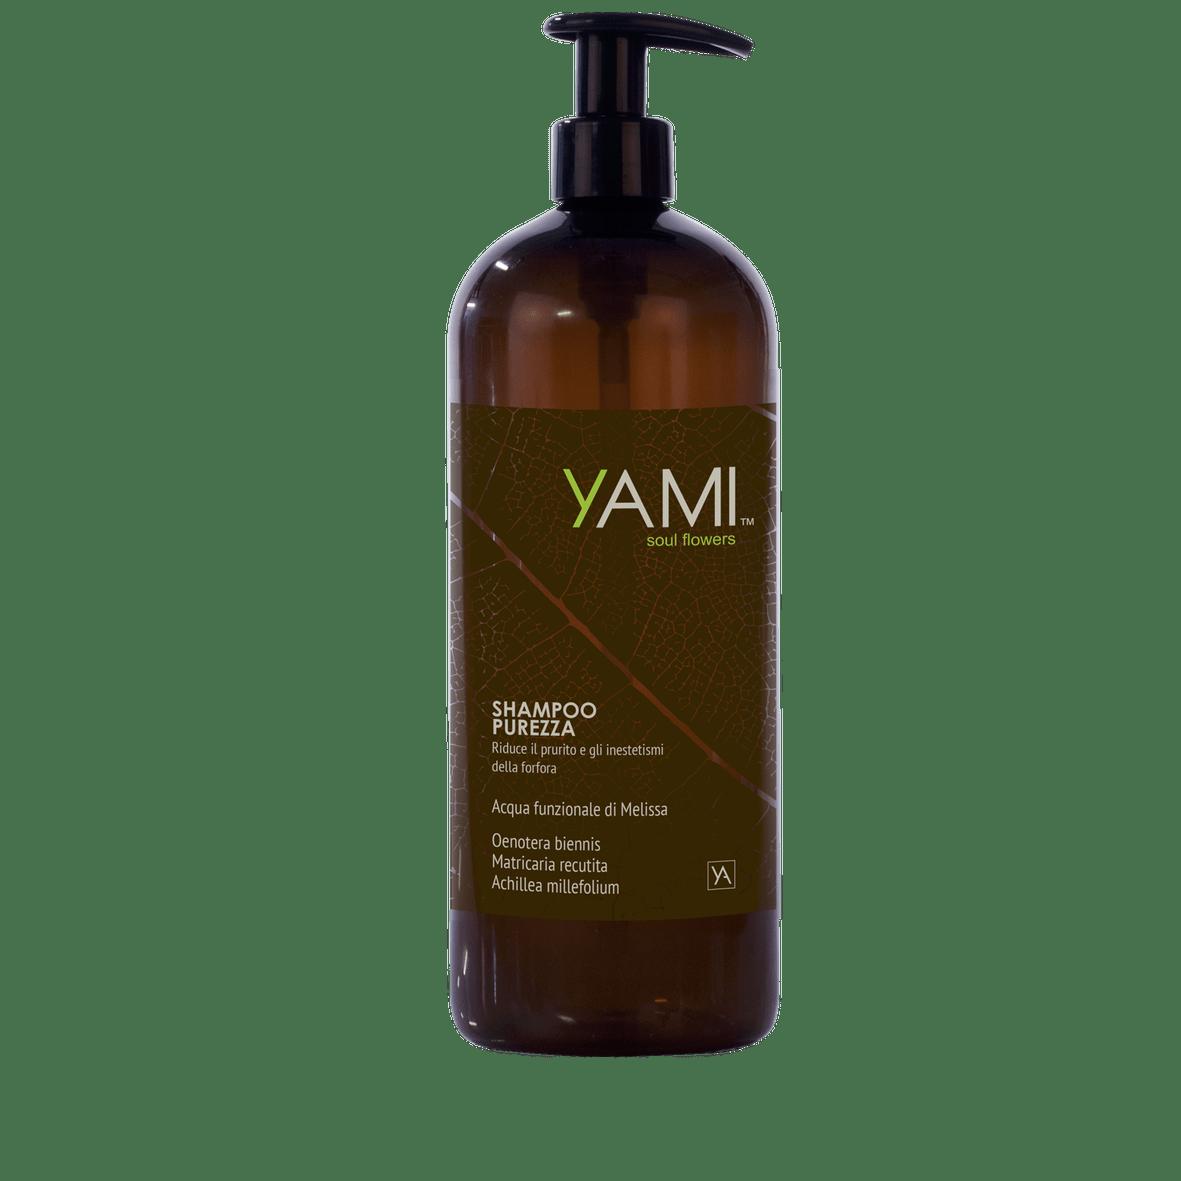 shampoo Purezza 1000ml